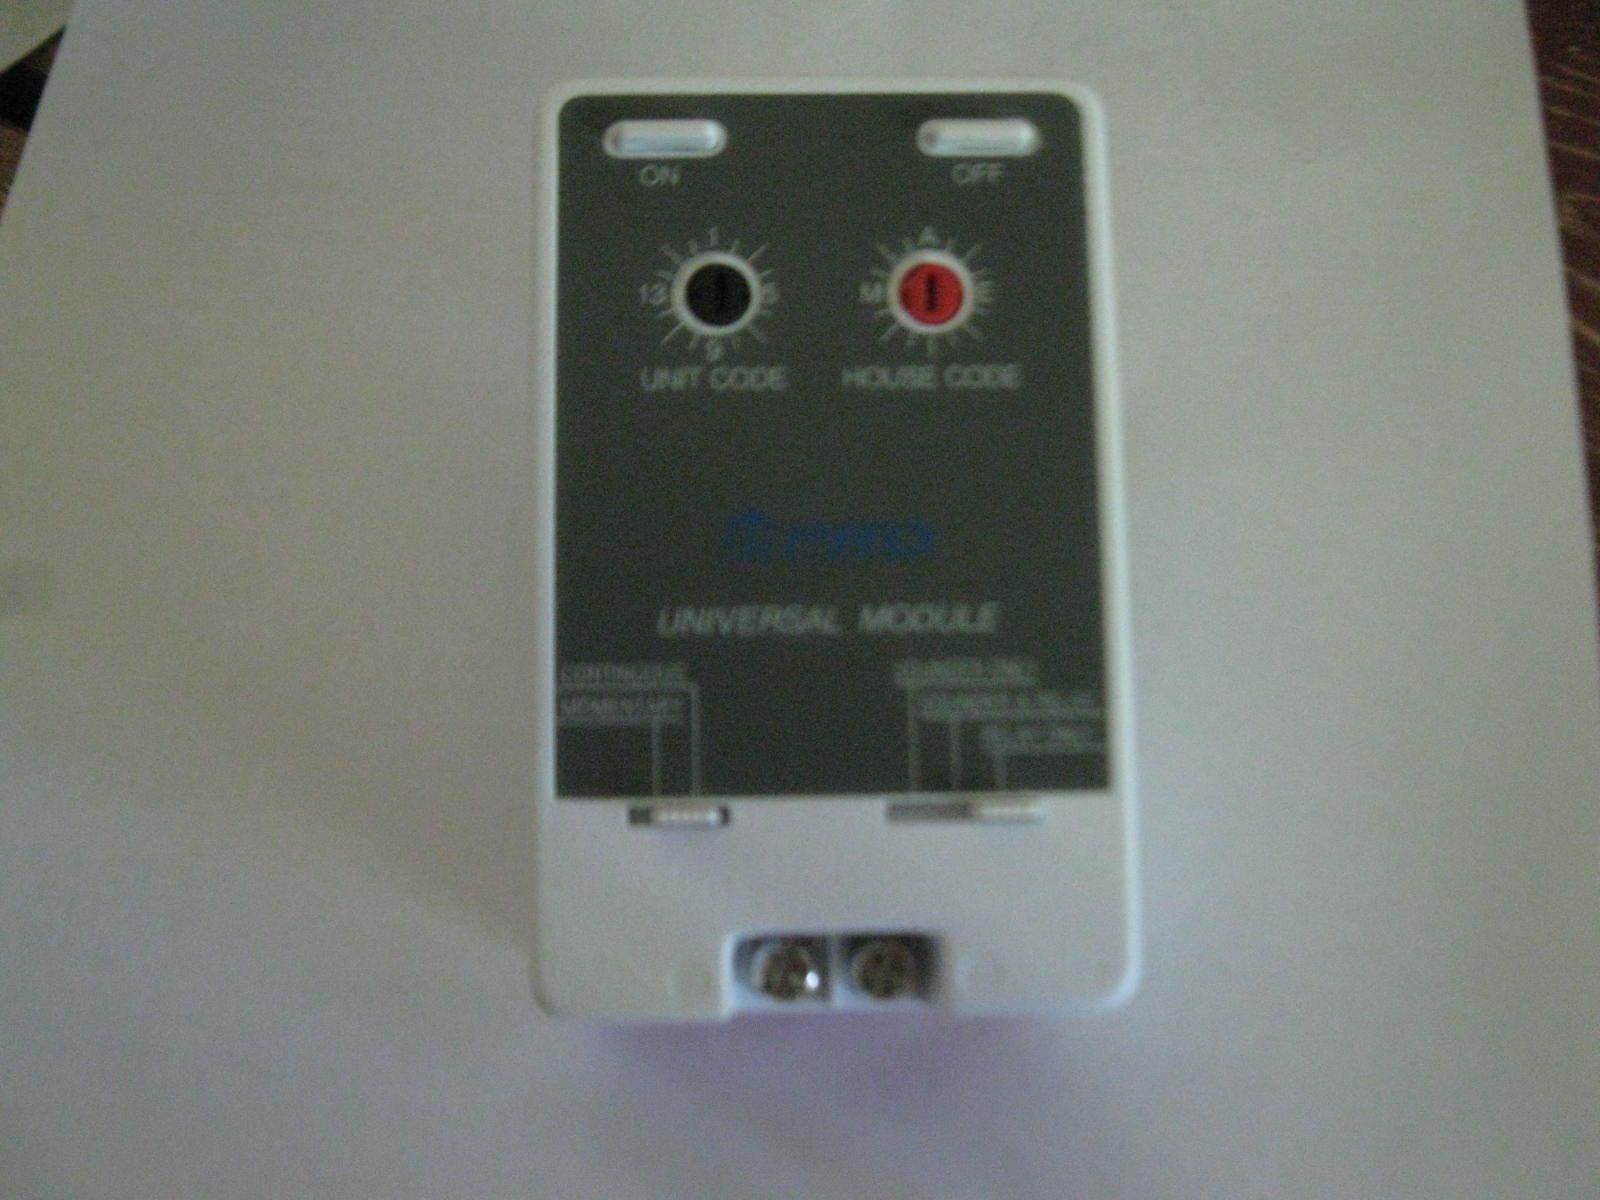 X10 X 10 X-10 Pro PUM01 Universal Module home automation receiver/switch